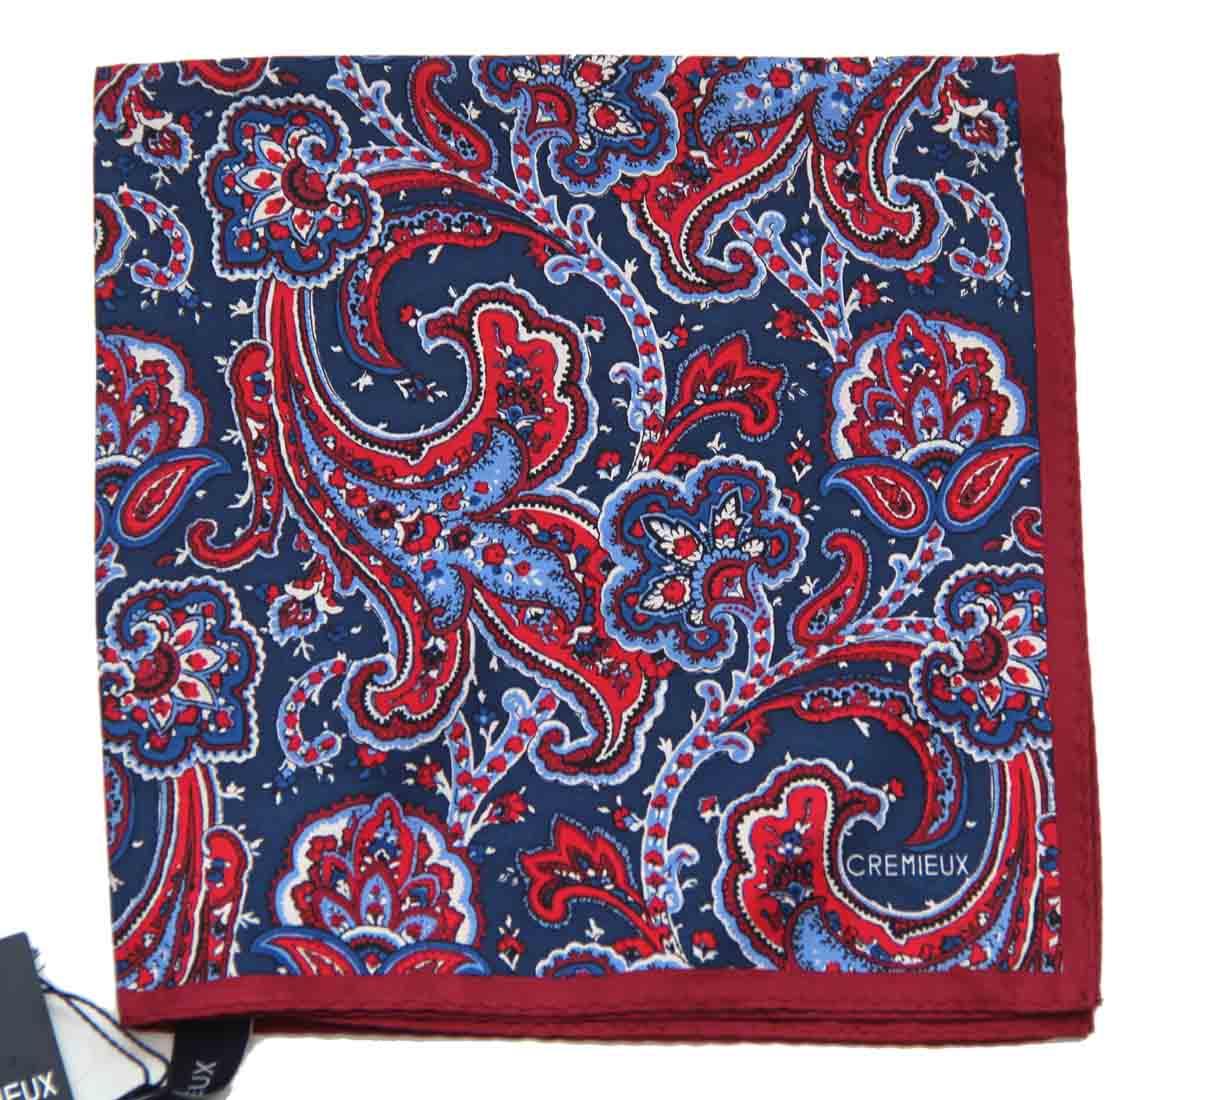 Daniel Cremieux Pocket Square Silk Red White Navy Blue Men's